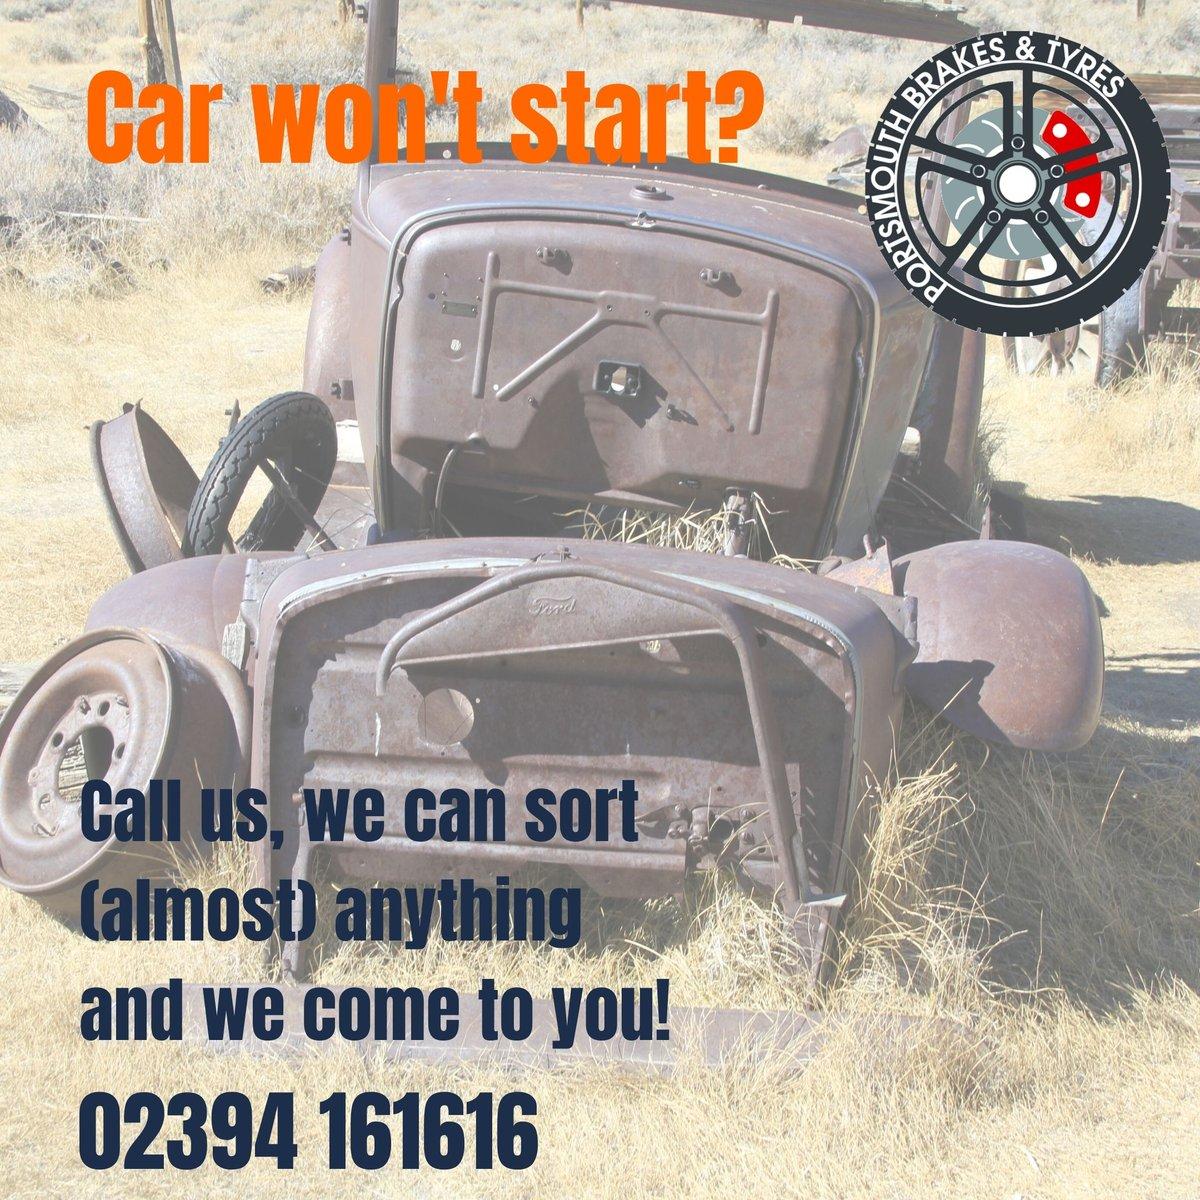 Call us 02394 161616 Message us  Like, follow and share   #mechaniclife #engine #automotive #cars #mechanicslife #car #carrepair #tyres #wheels #rims #brakes #breakdown #servicepic.twitter.com/QsGpKaPt6t